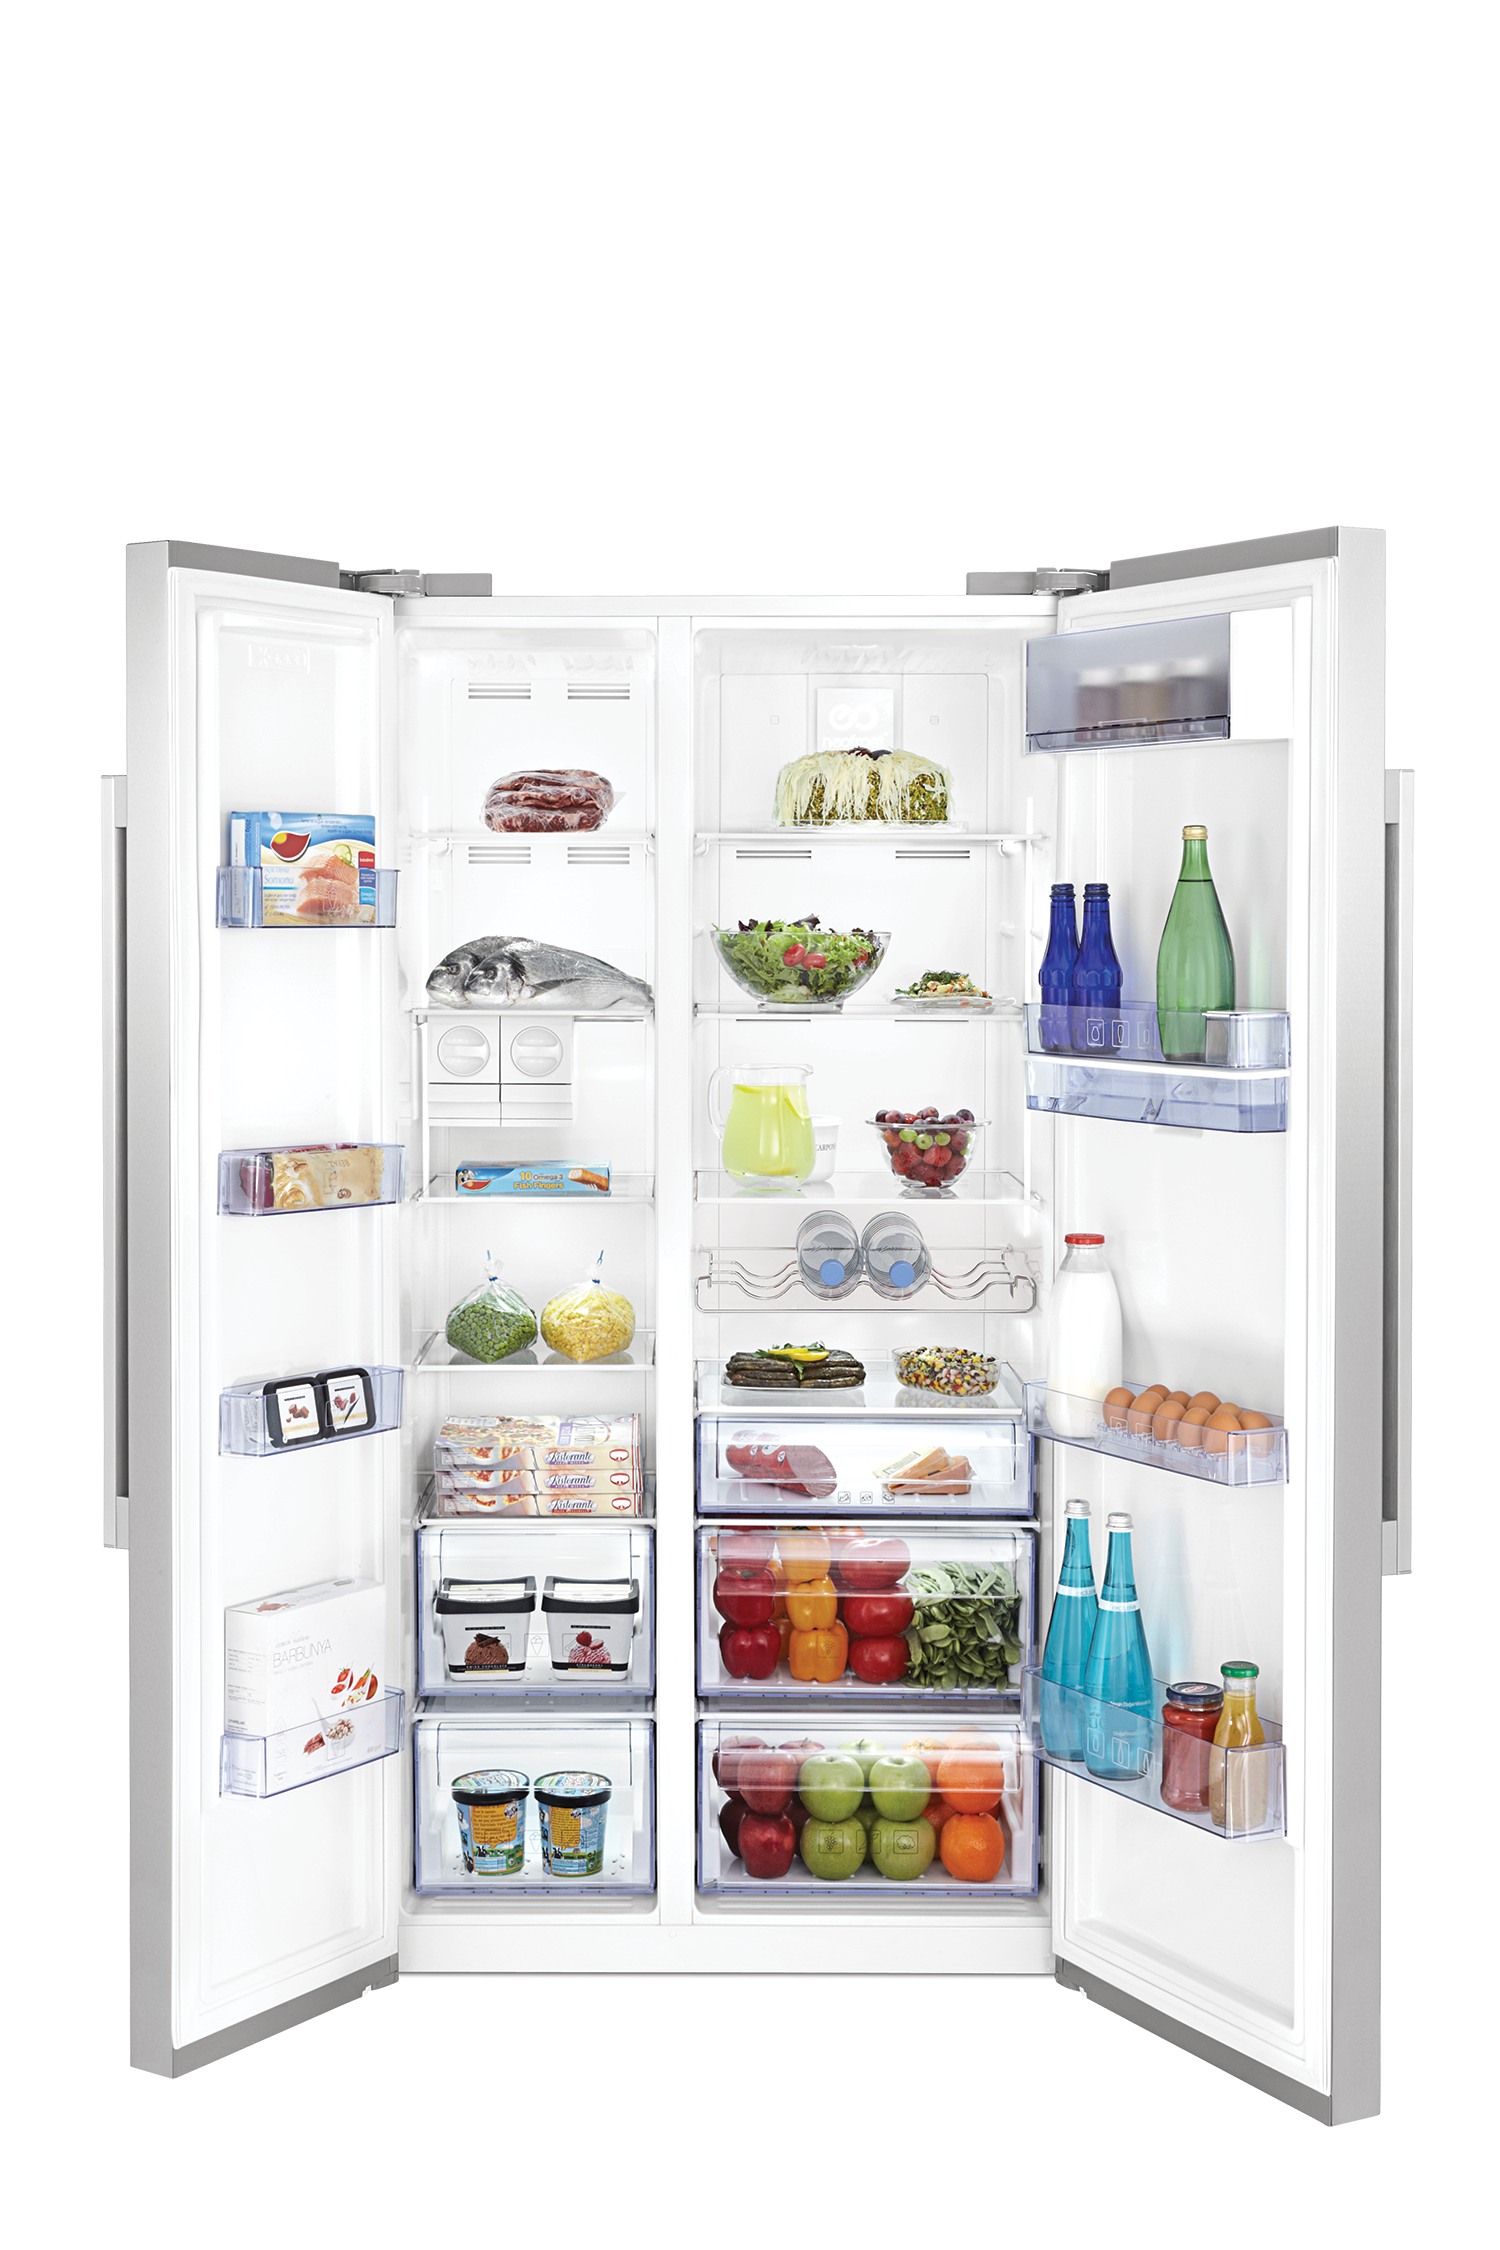 Brummender Kühlschrank